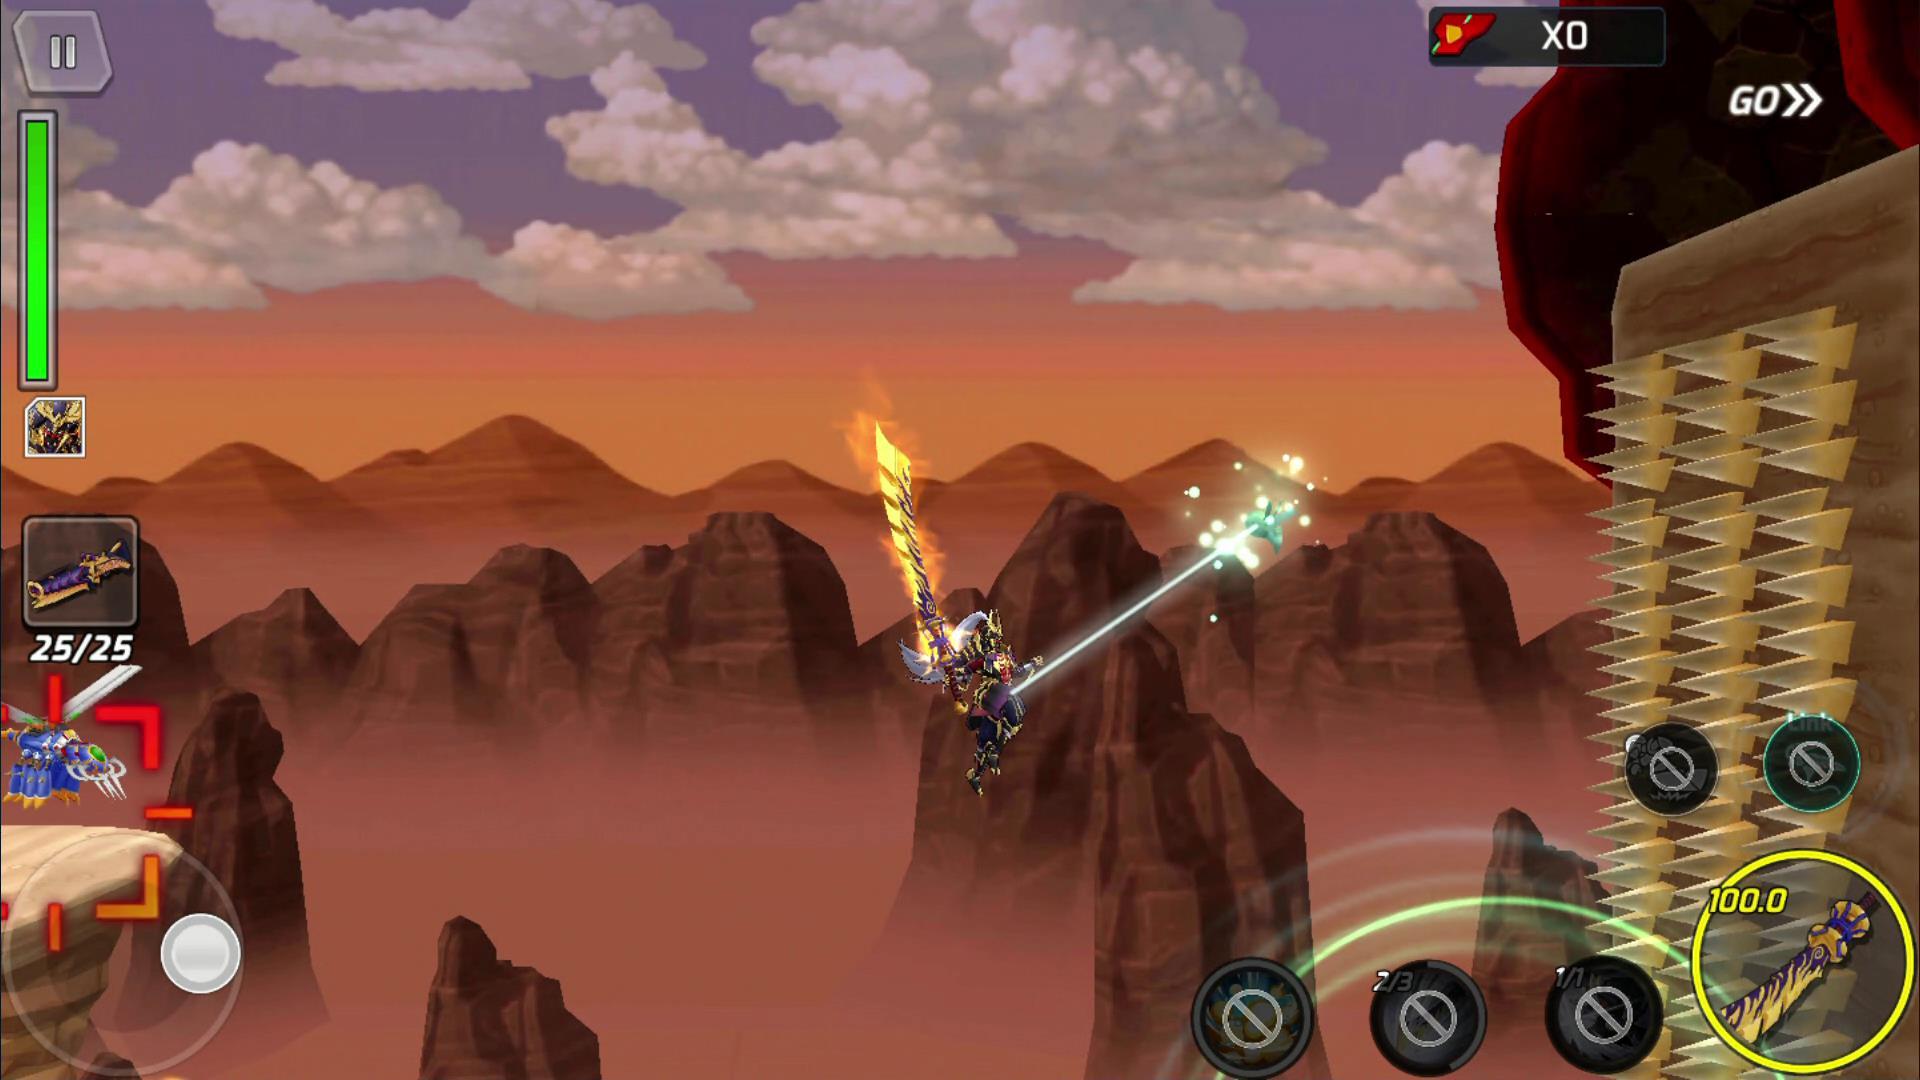 《ROCKMAN X DiVE》「怨虎龍西格瑪」襲來,狩獵討伐正式開始